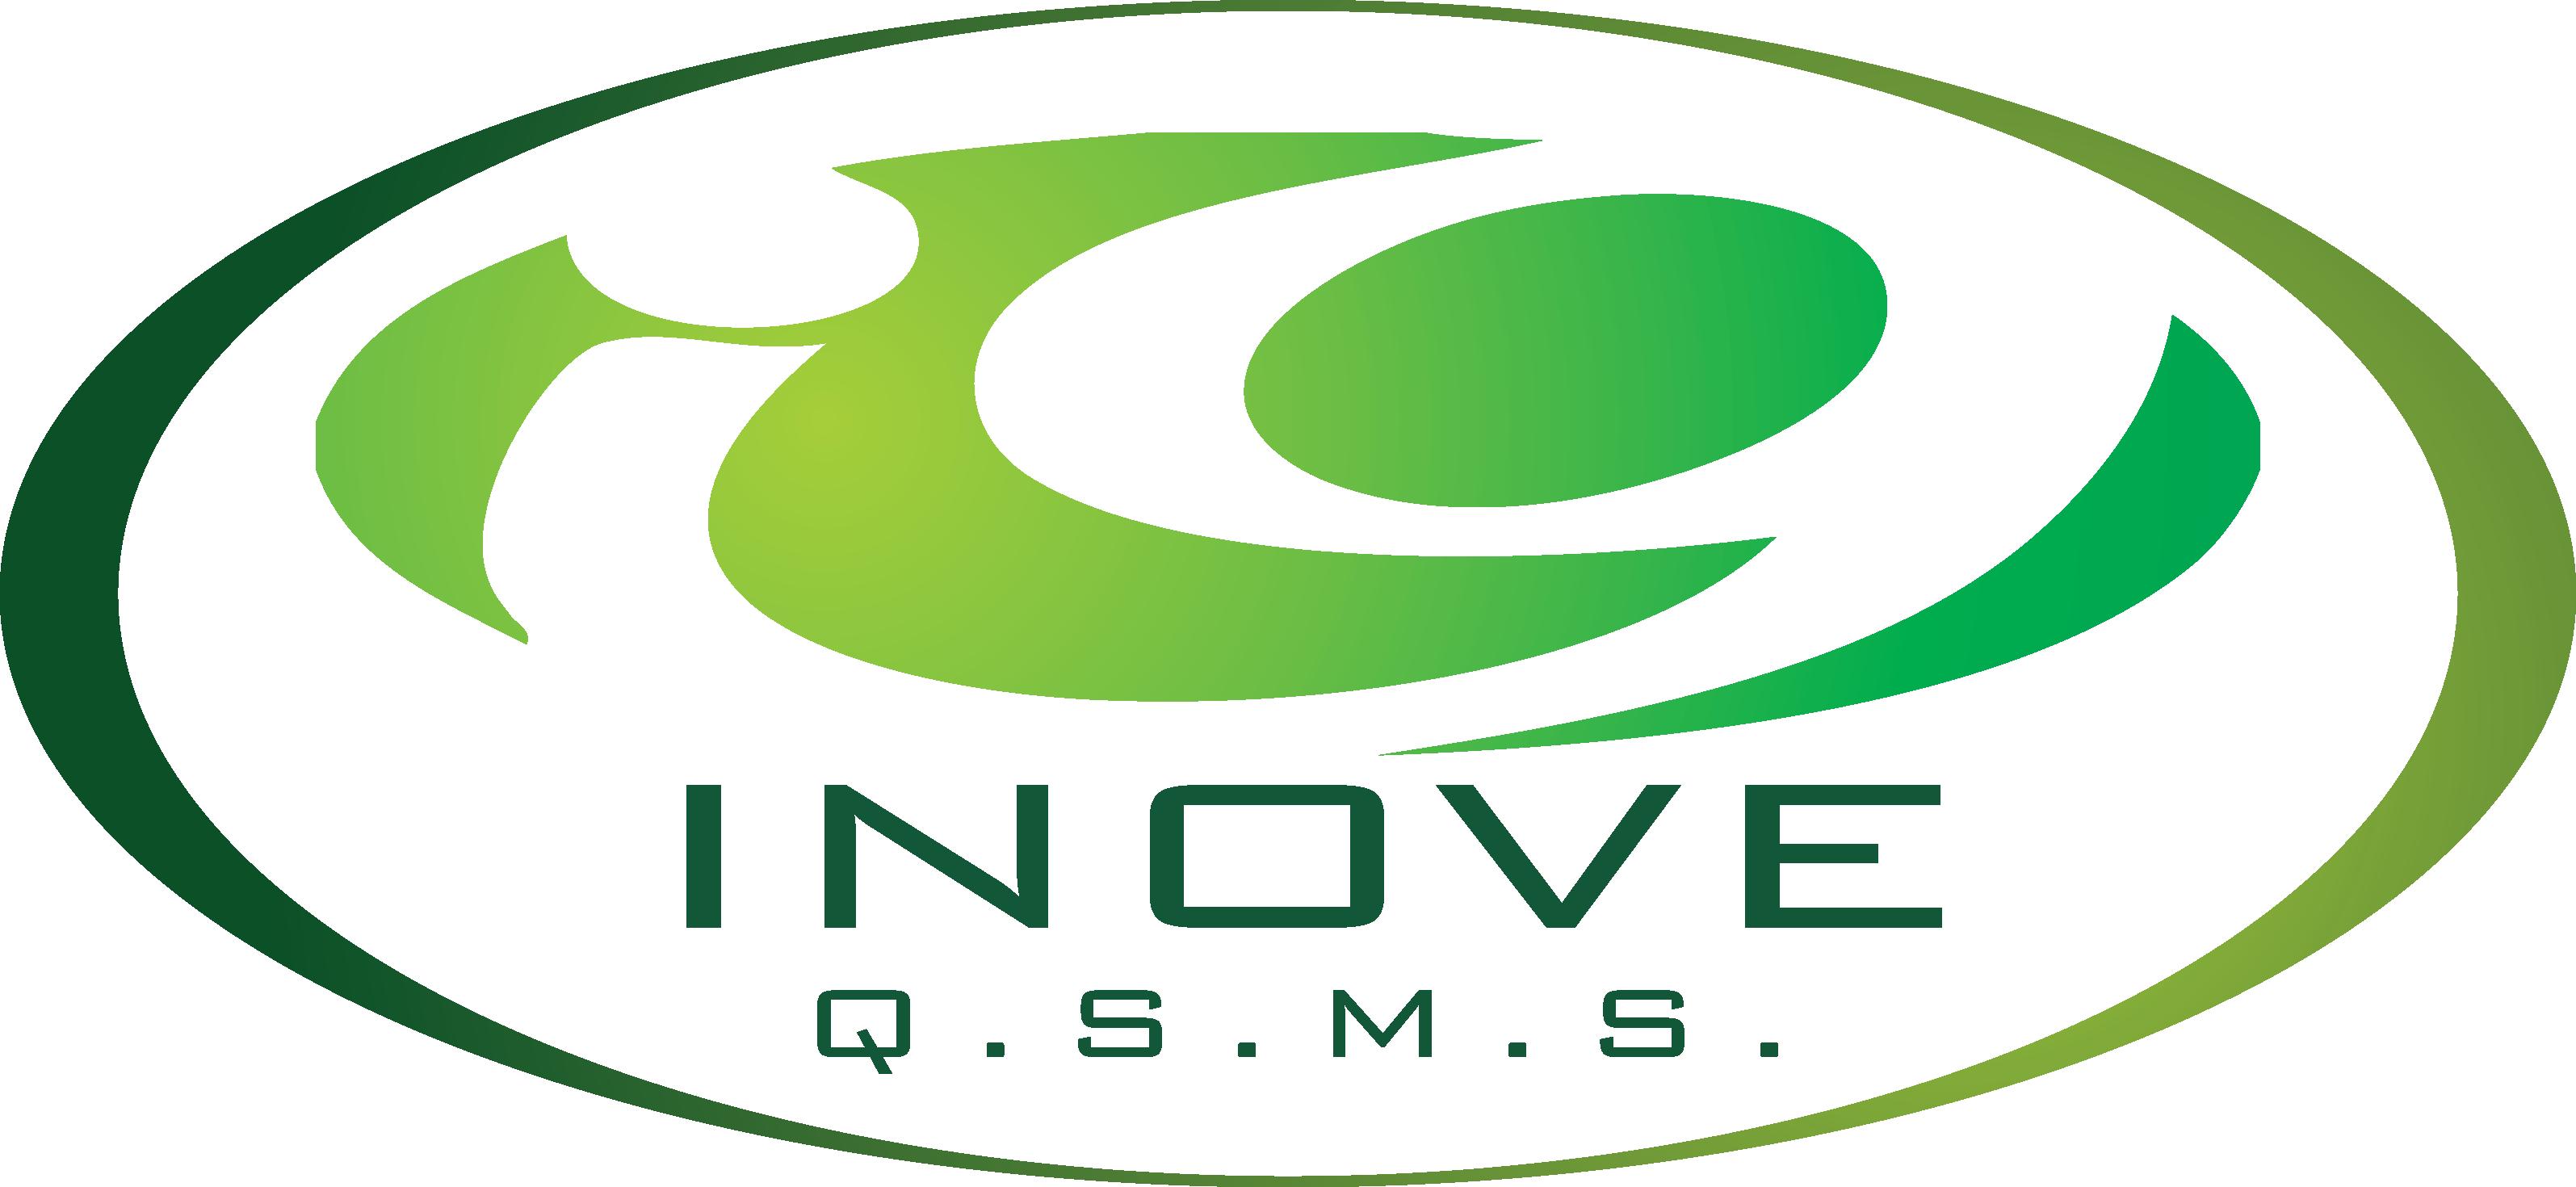 - INOVE QSMS